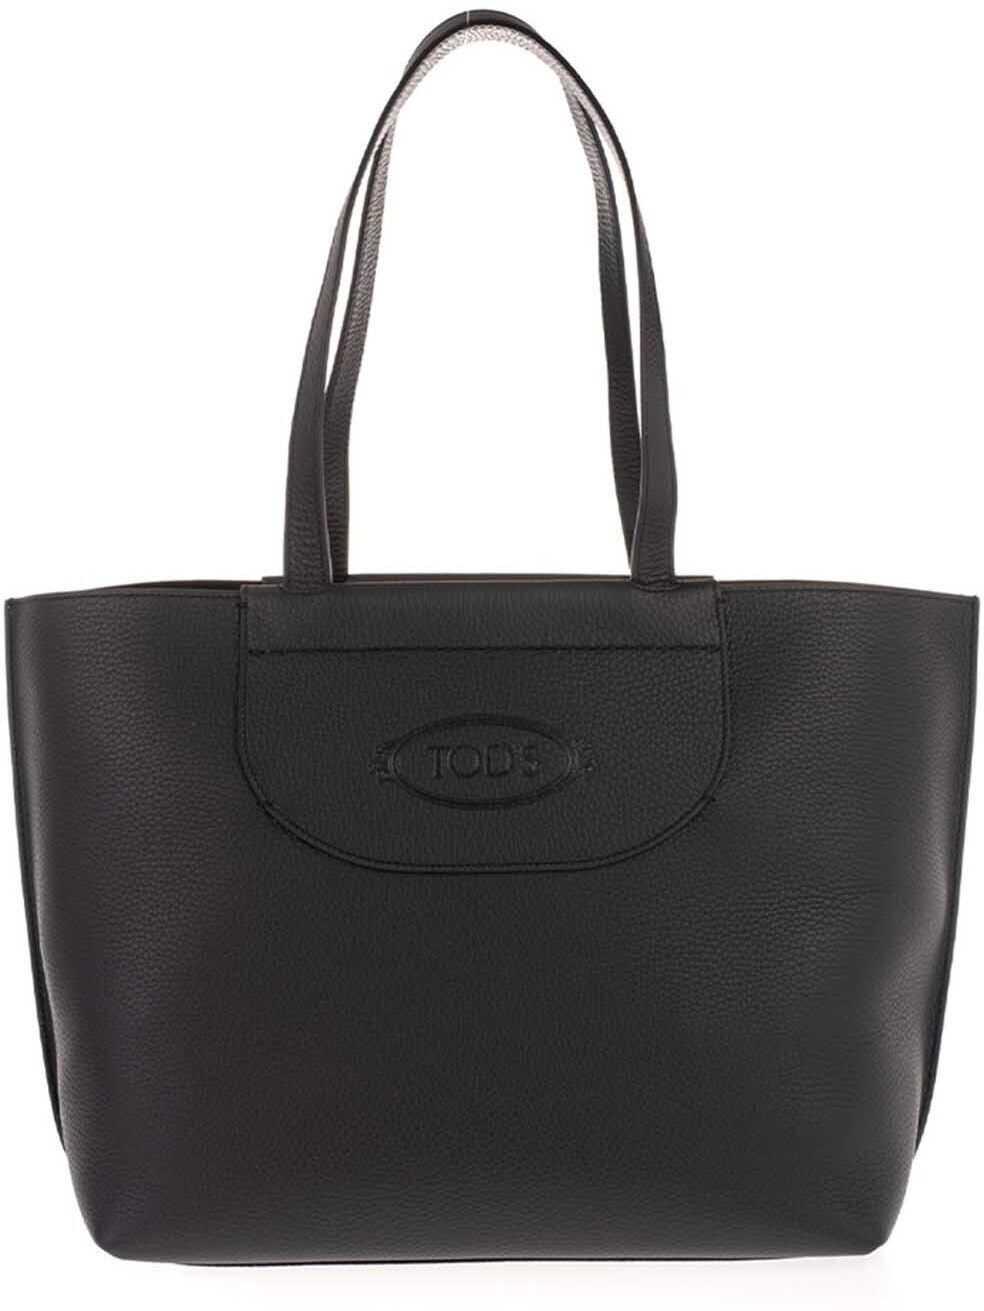 TOD'S Medium Shopper Bag In Black XBWAOLA0300RIAB999 Black imagine b-mall.ro